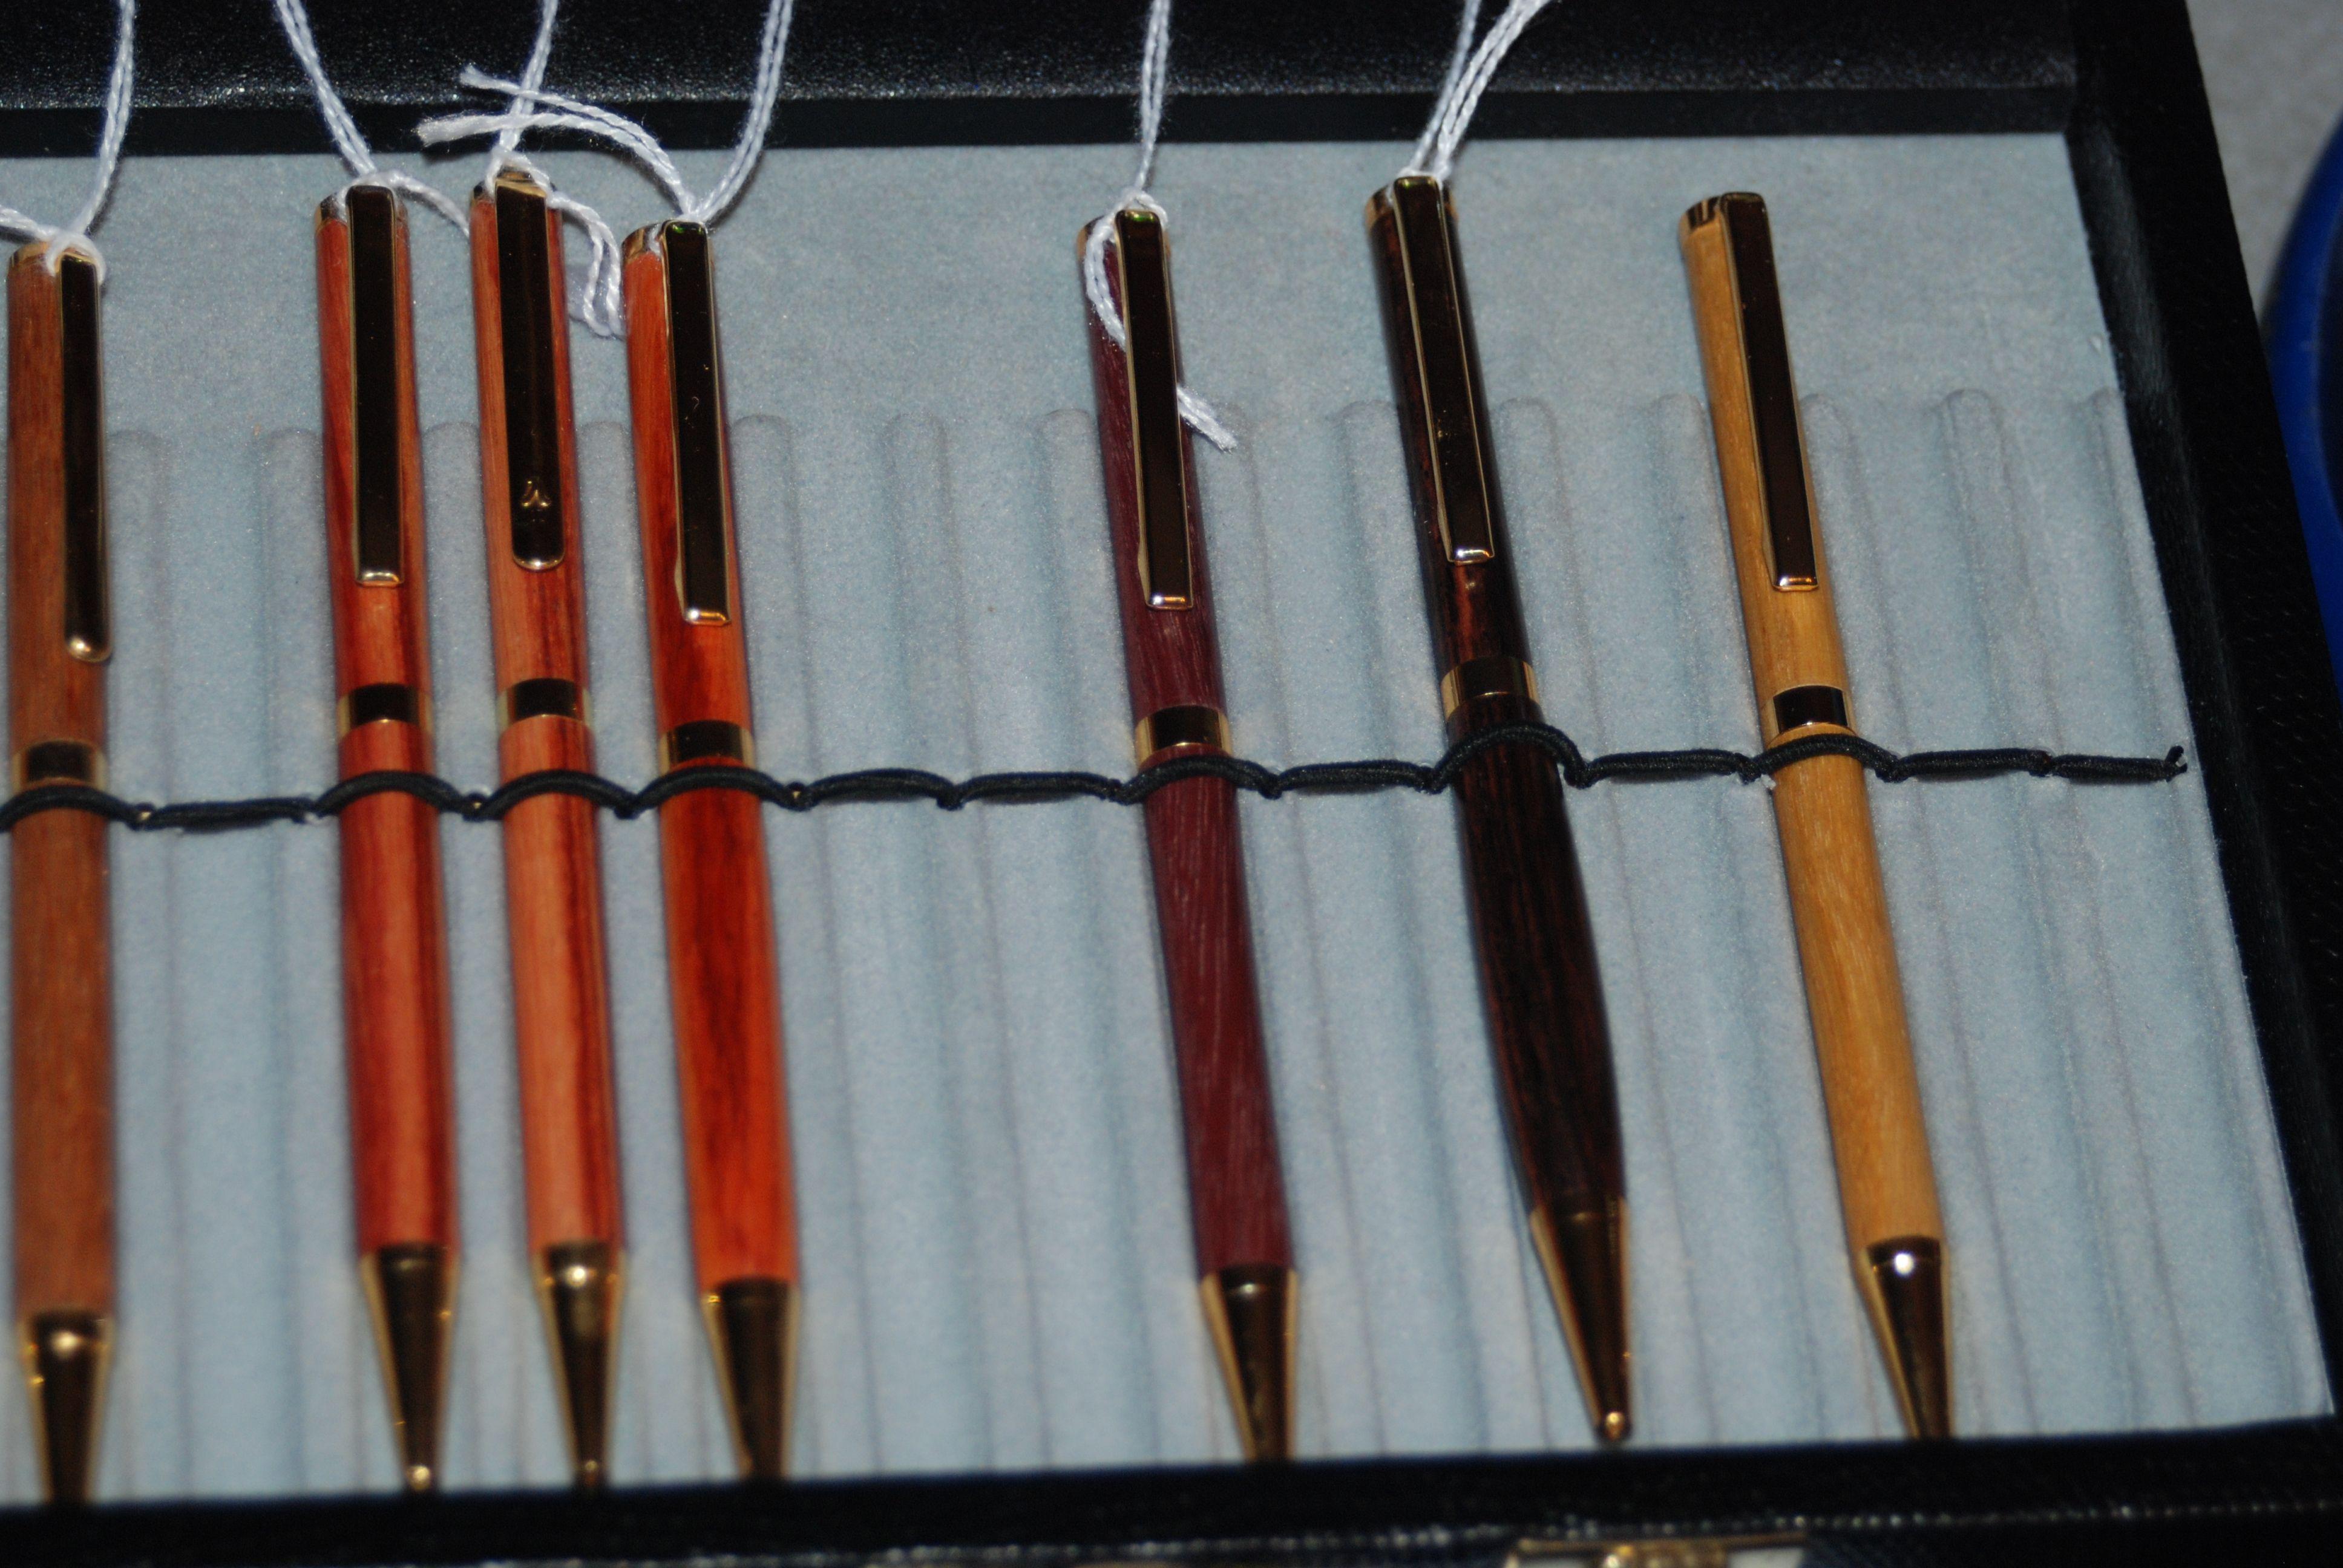 Group 1 Teacher's pens 2011